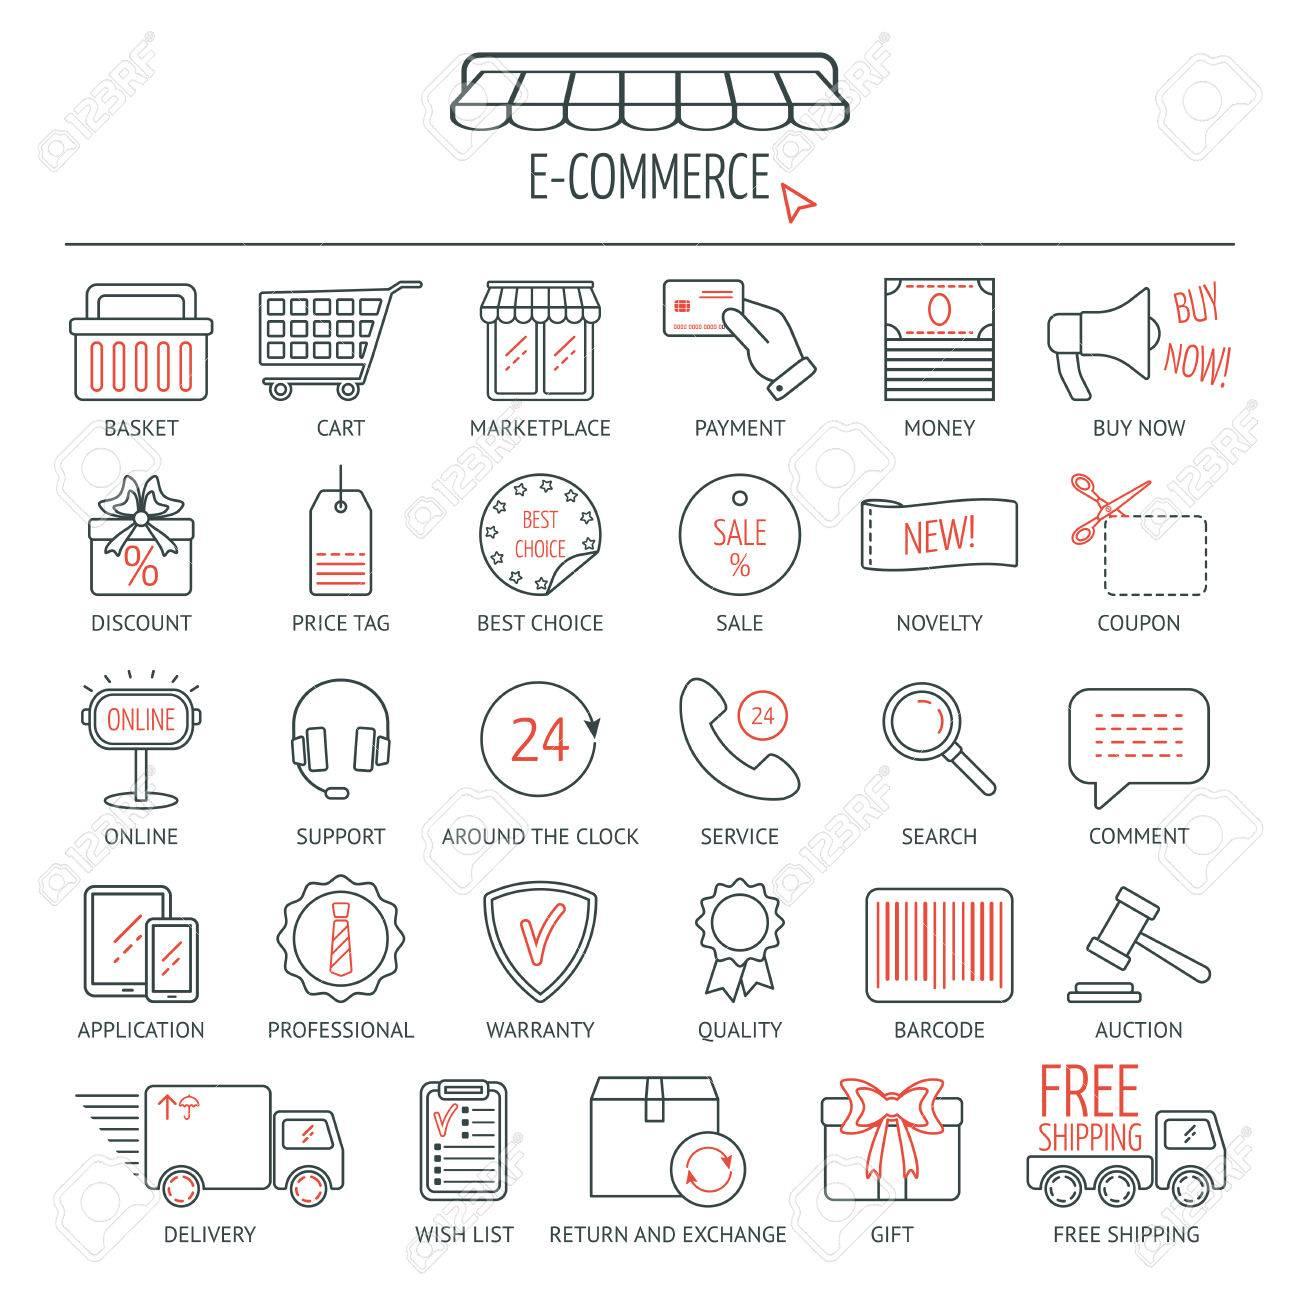 E commerce icon set modern line icons for business web development e commerce icon set modern line icons for business web development and landing altavistaventures Images